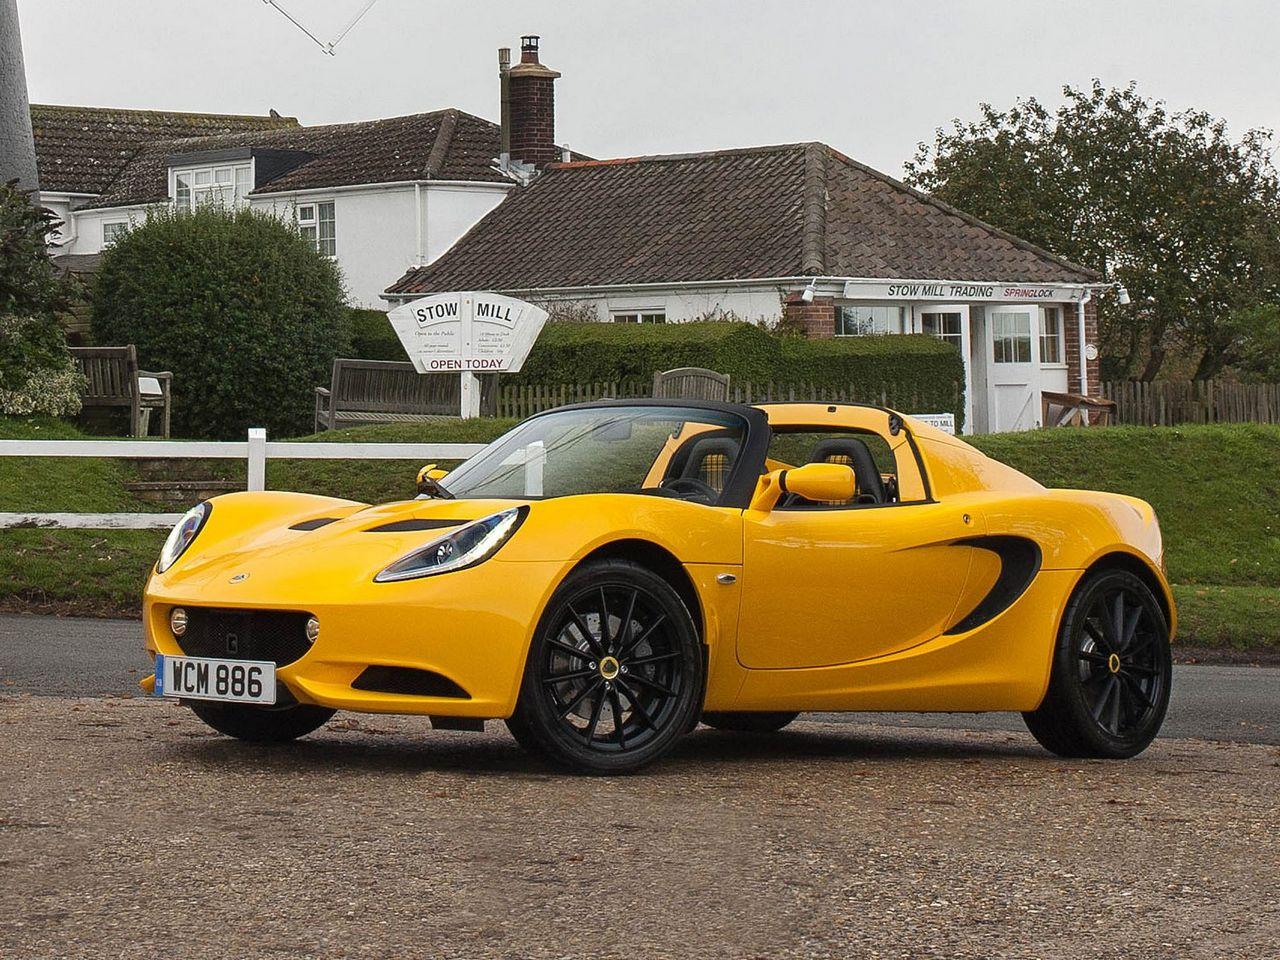 Lotus-Elise-Sport-Elise-Sport-220-prezzo-price_0-100_5